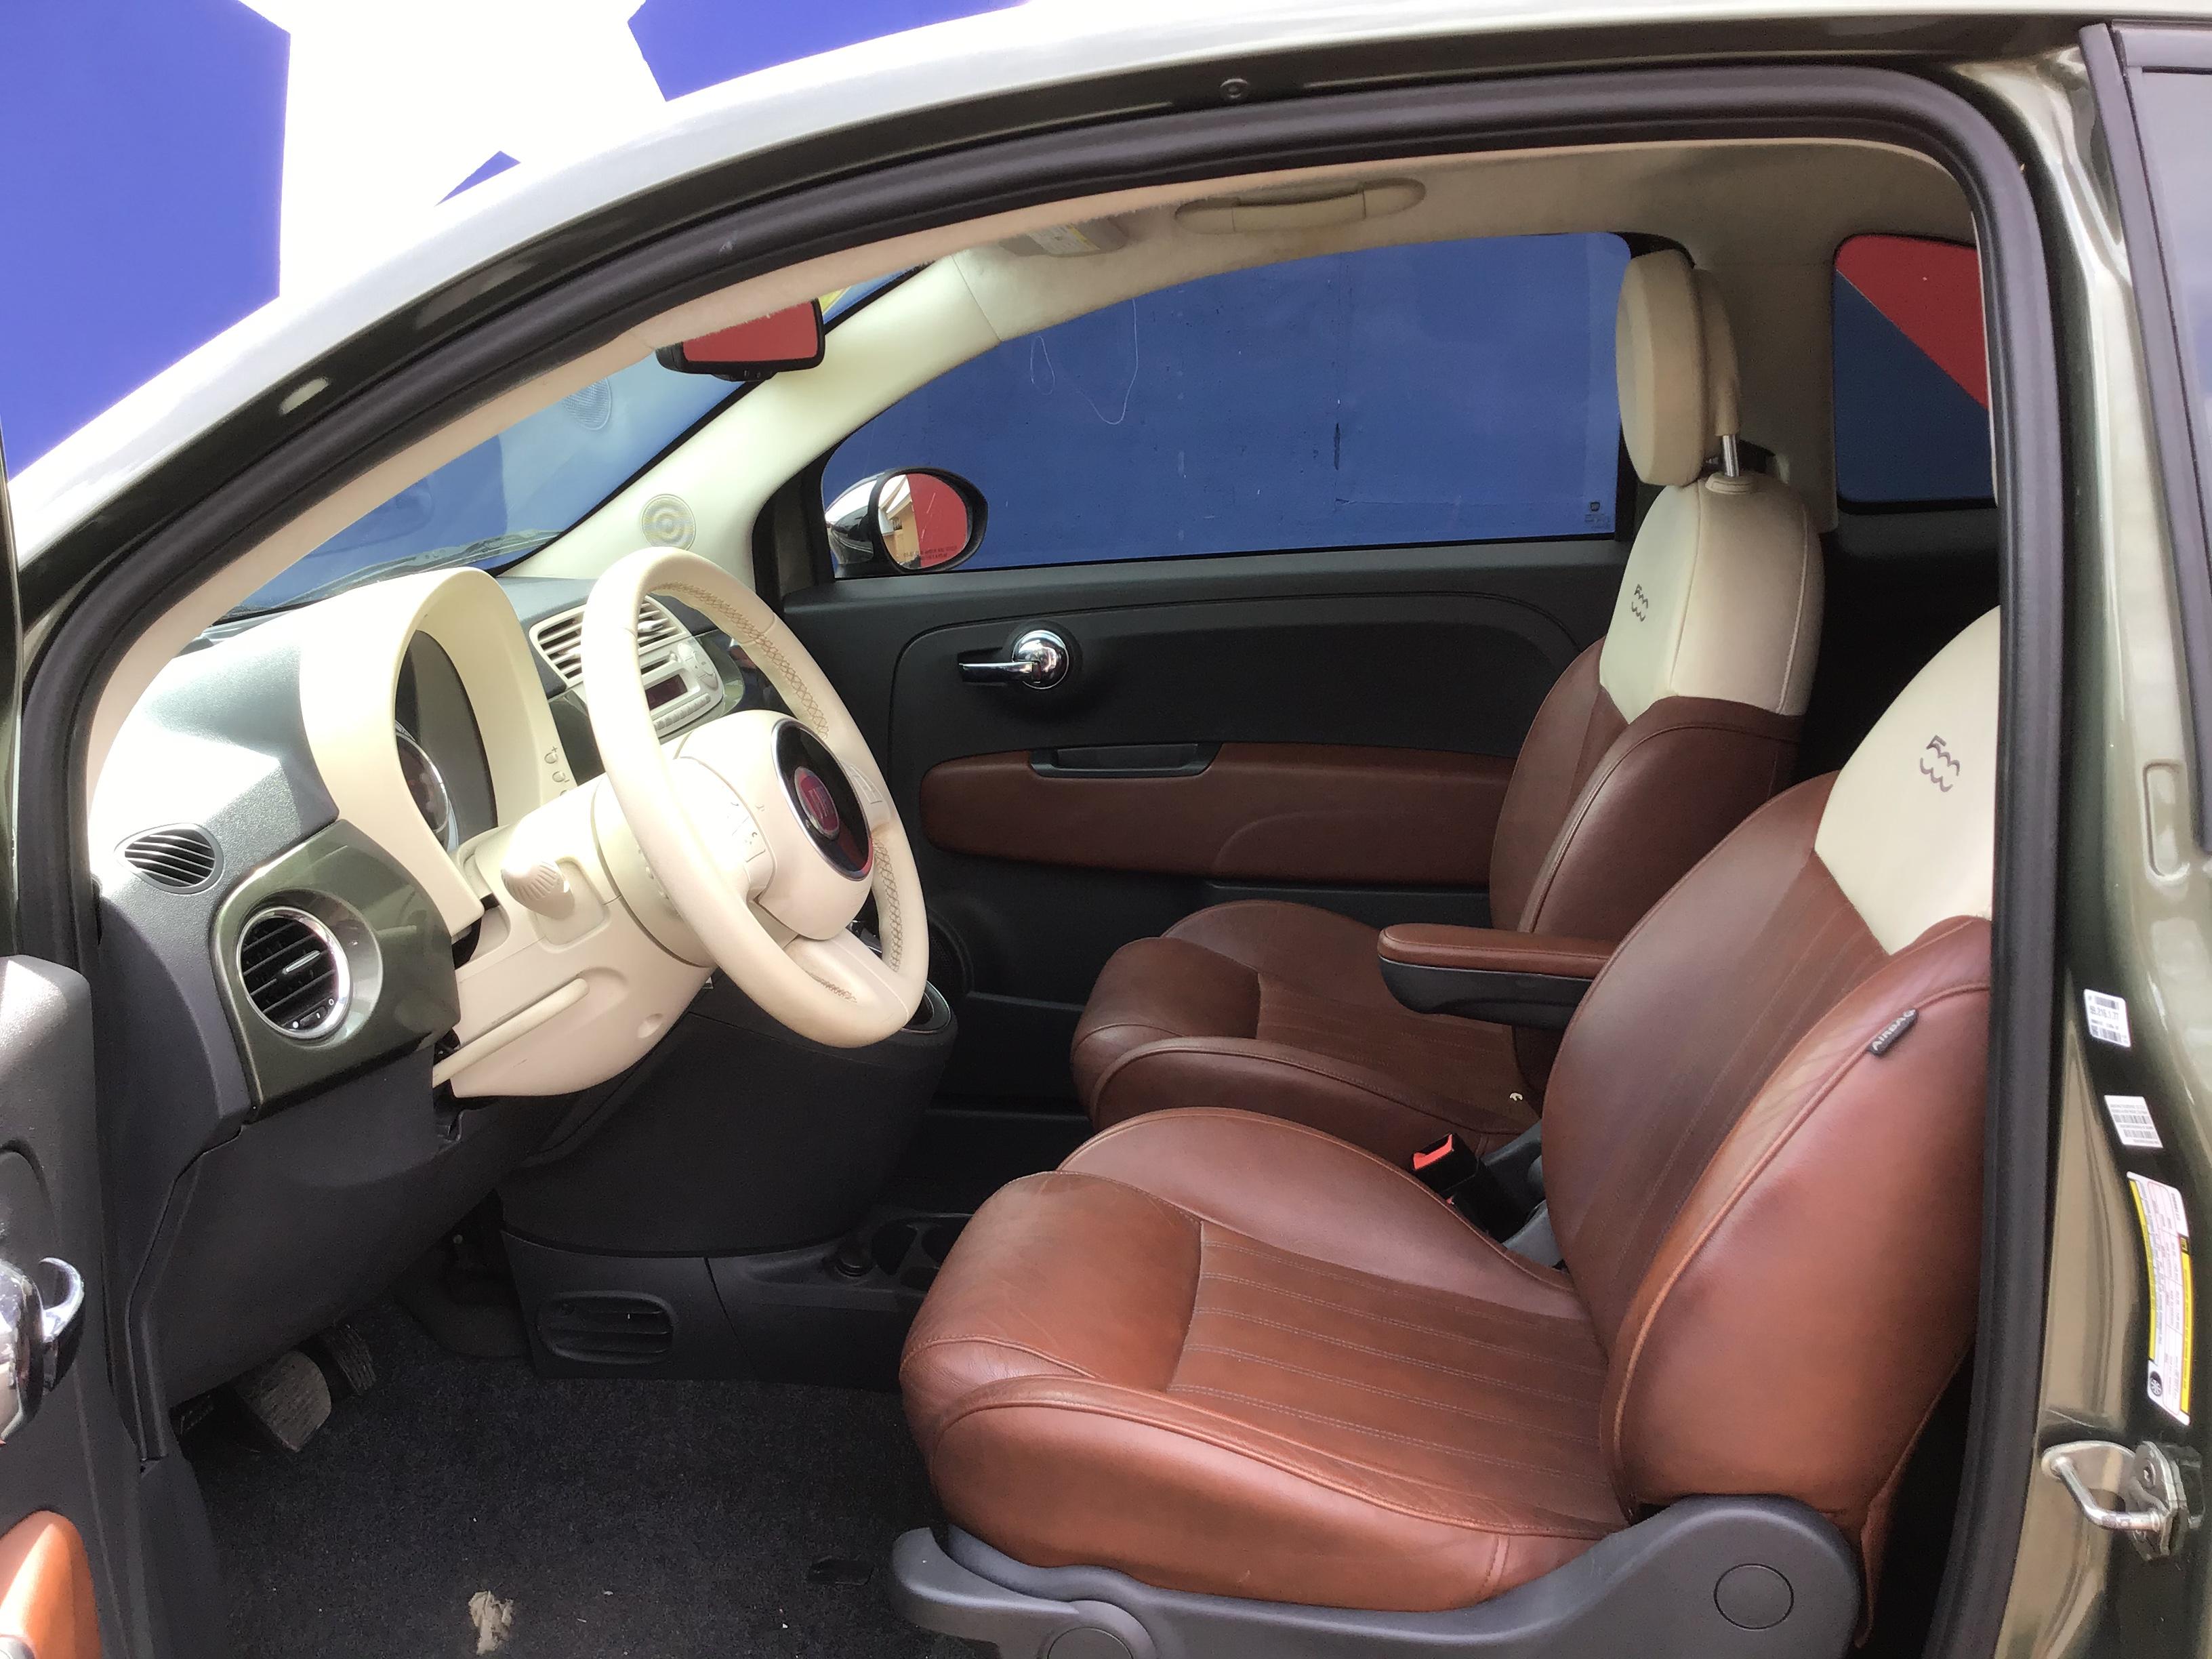 used vehicle - Coupe FIAT 500 2012